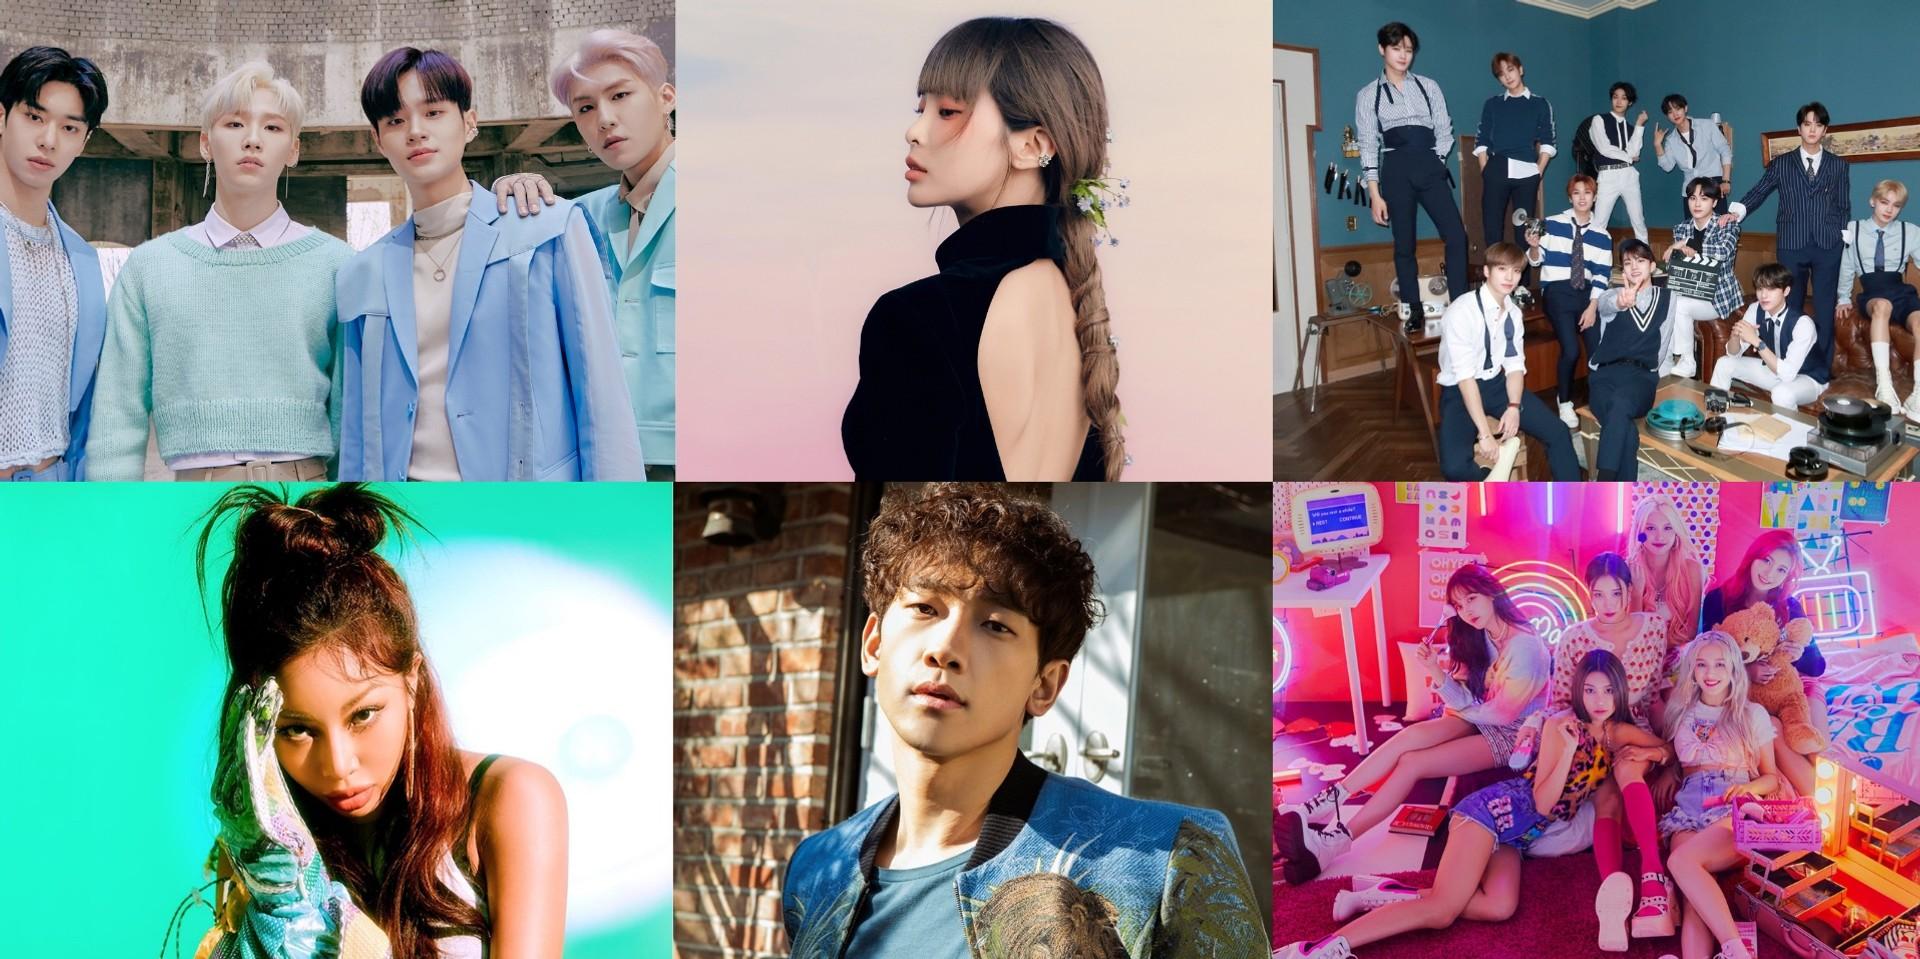 THE BOYZ, Heize, Rain, MOMOLAND, Jessi, AB6IX, and more to perform at K-Pop SuperFest virtual festival